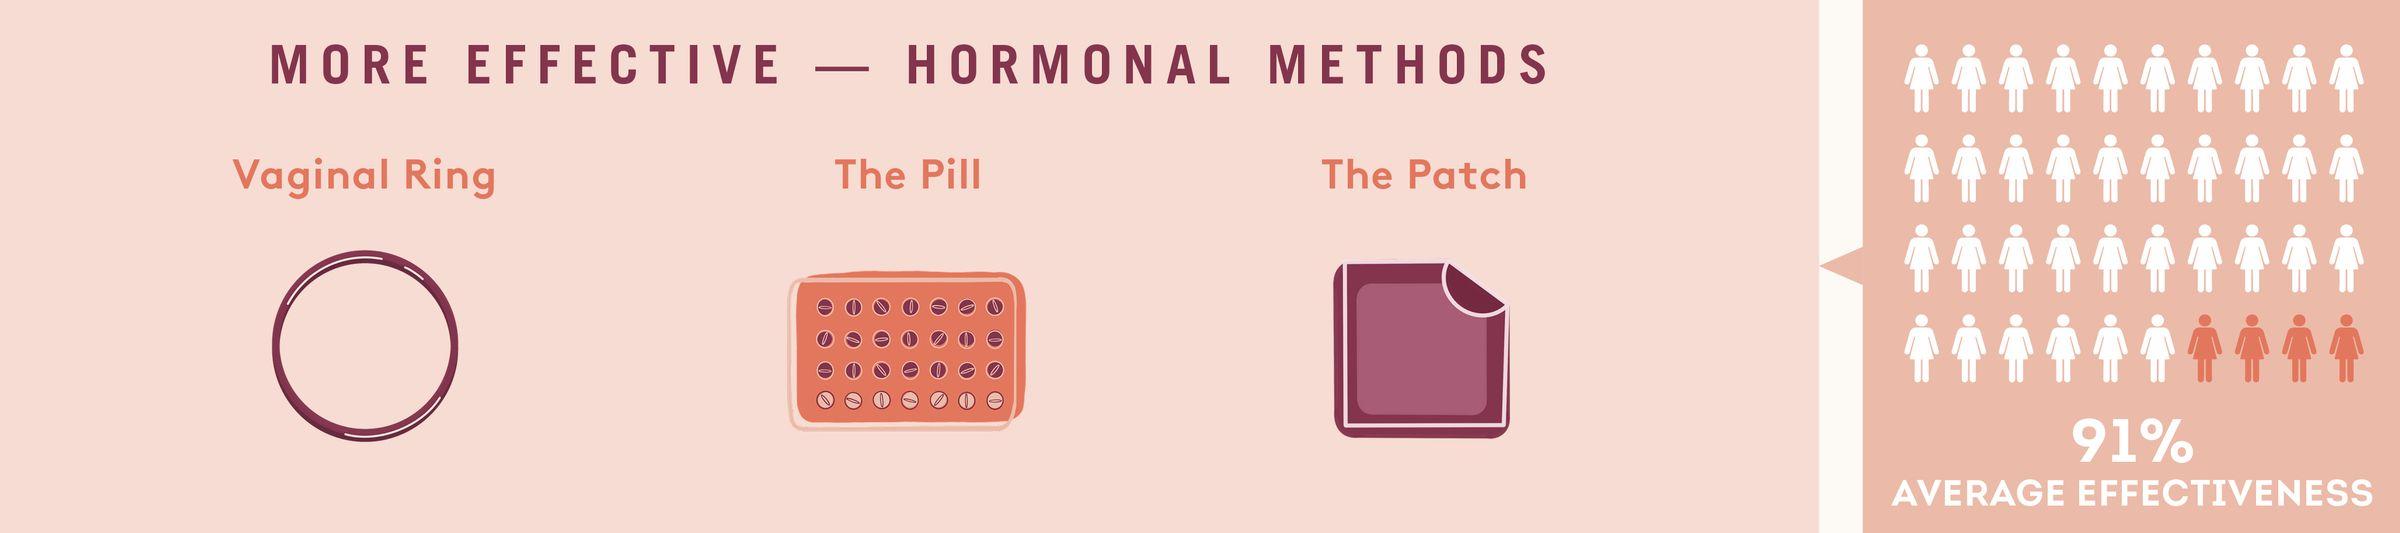 hormonal methods of birth control